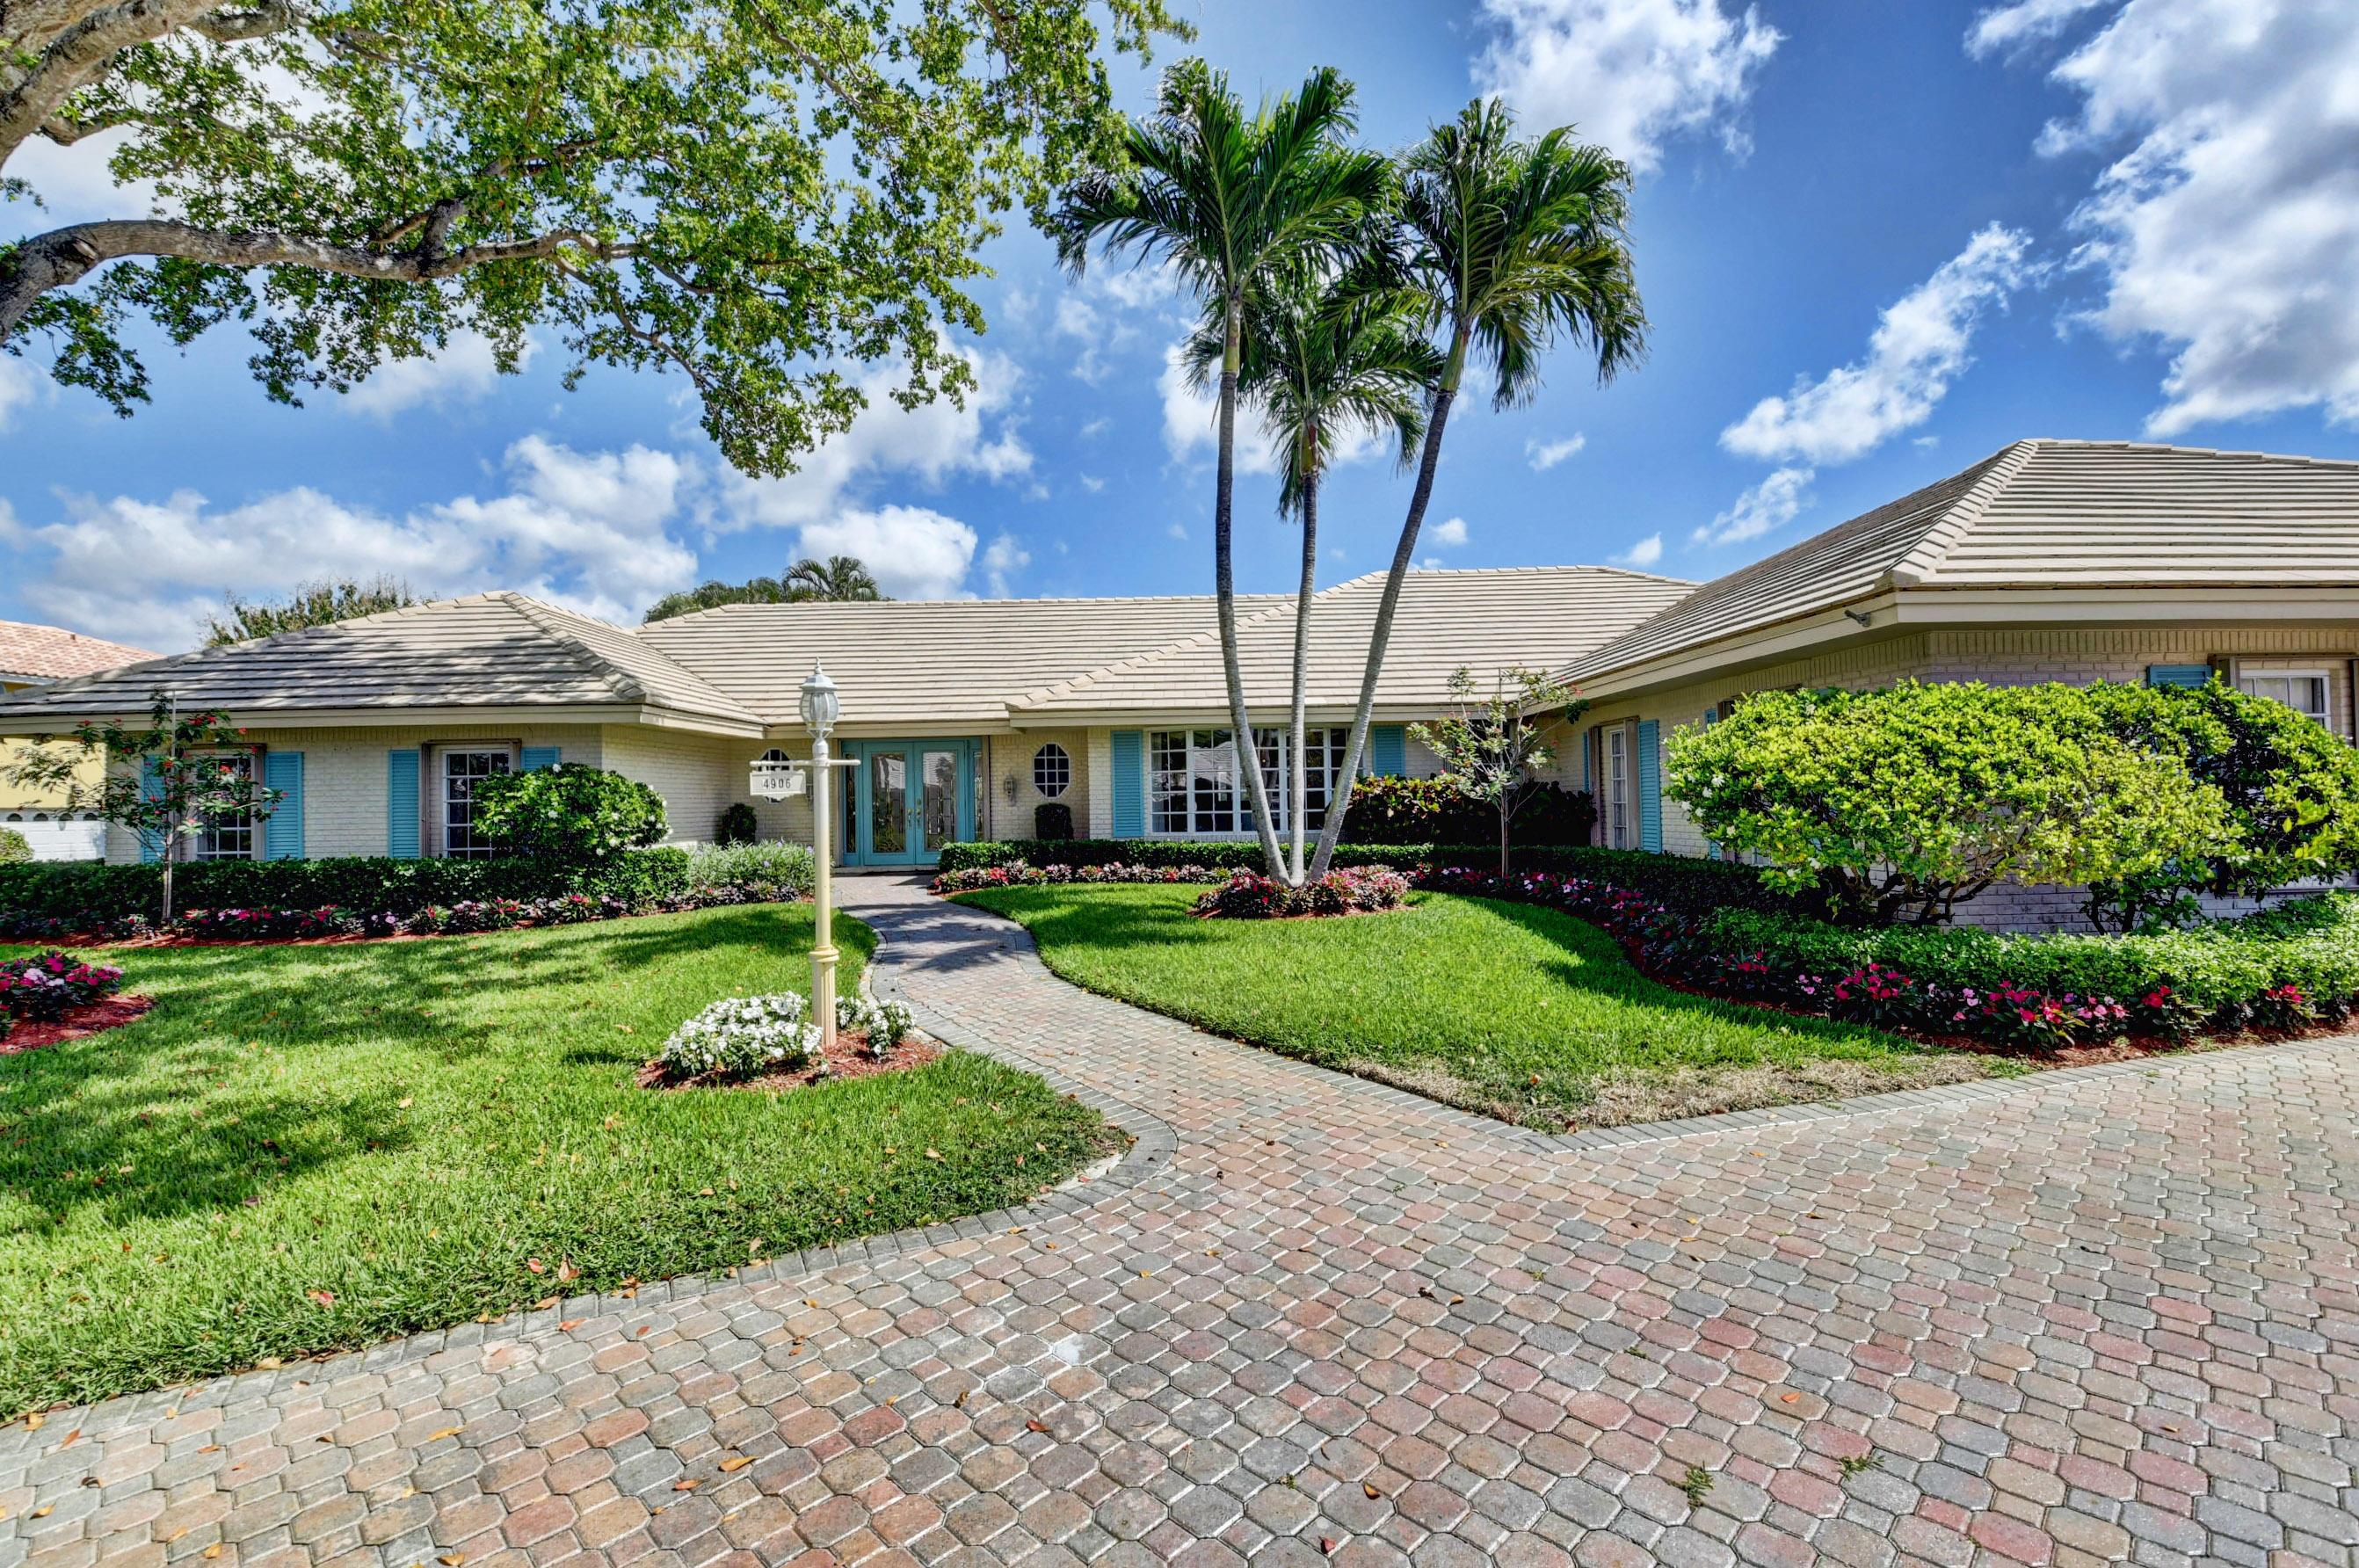 4906 S Lake Drive  For Sale 10699642, FL